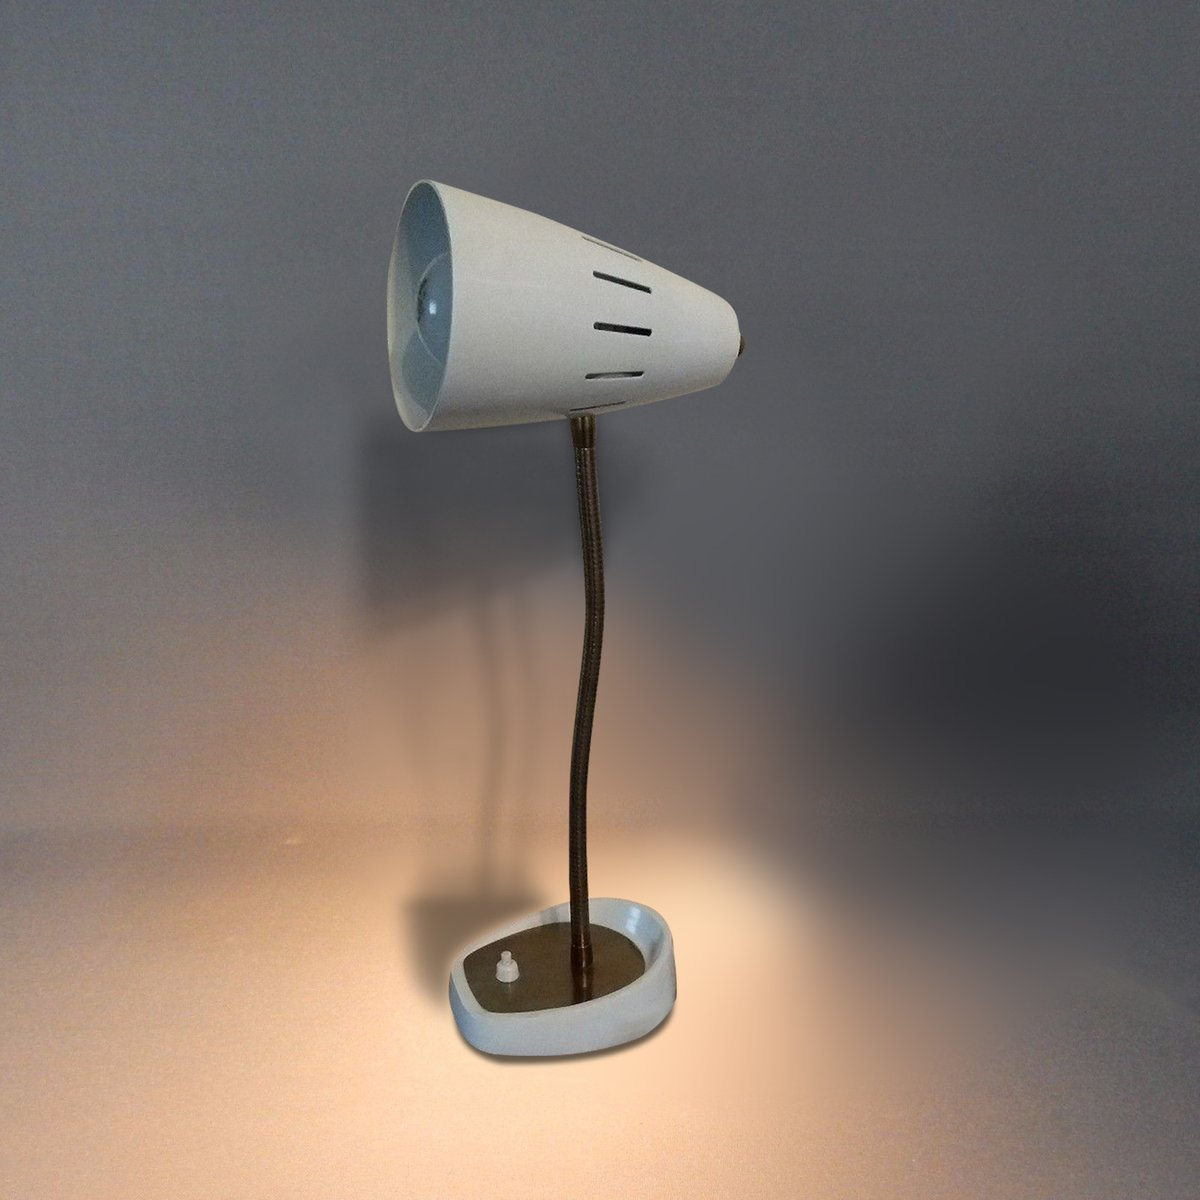 White British Model 971 Gooseneck Desk Lamp From Pifco, 1960s